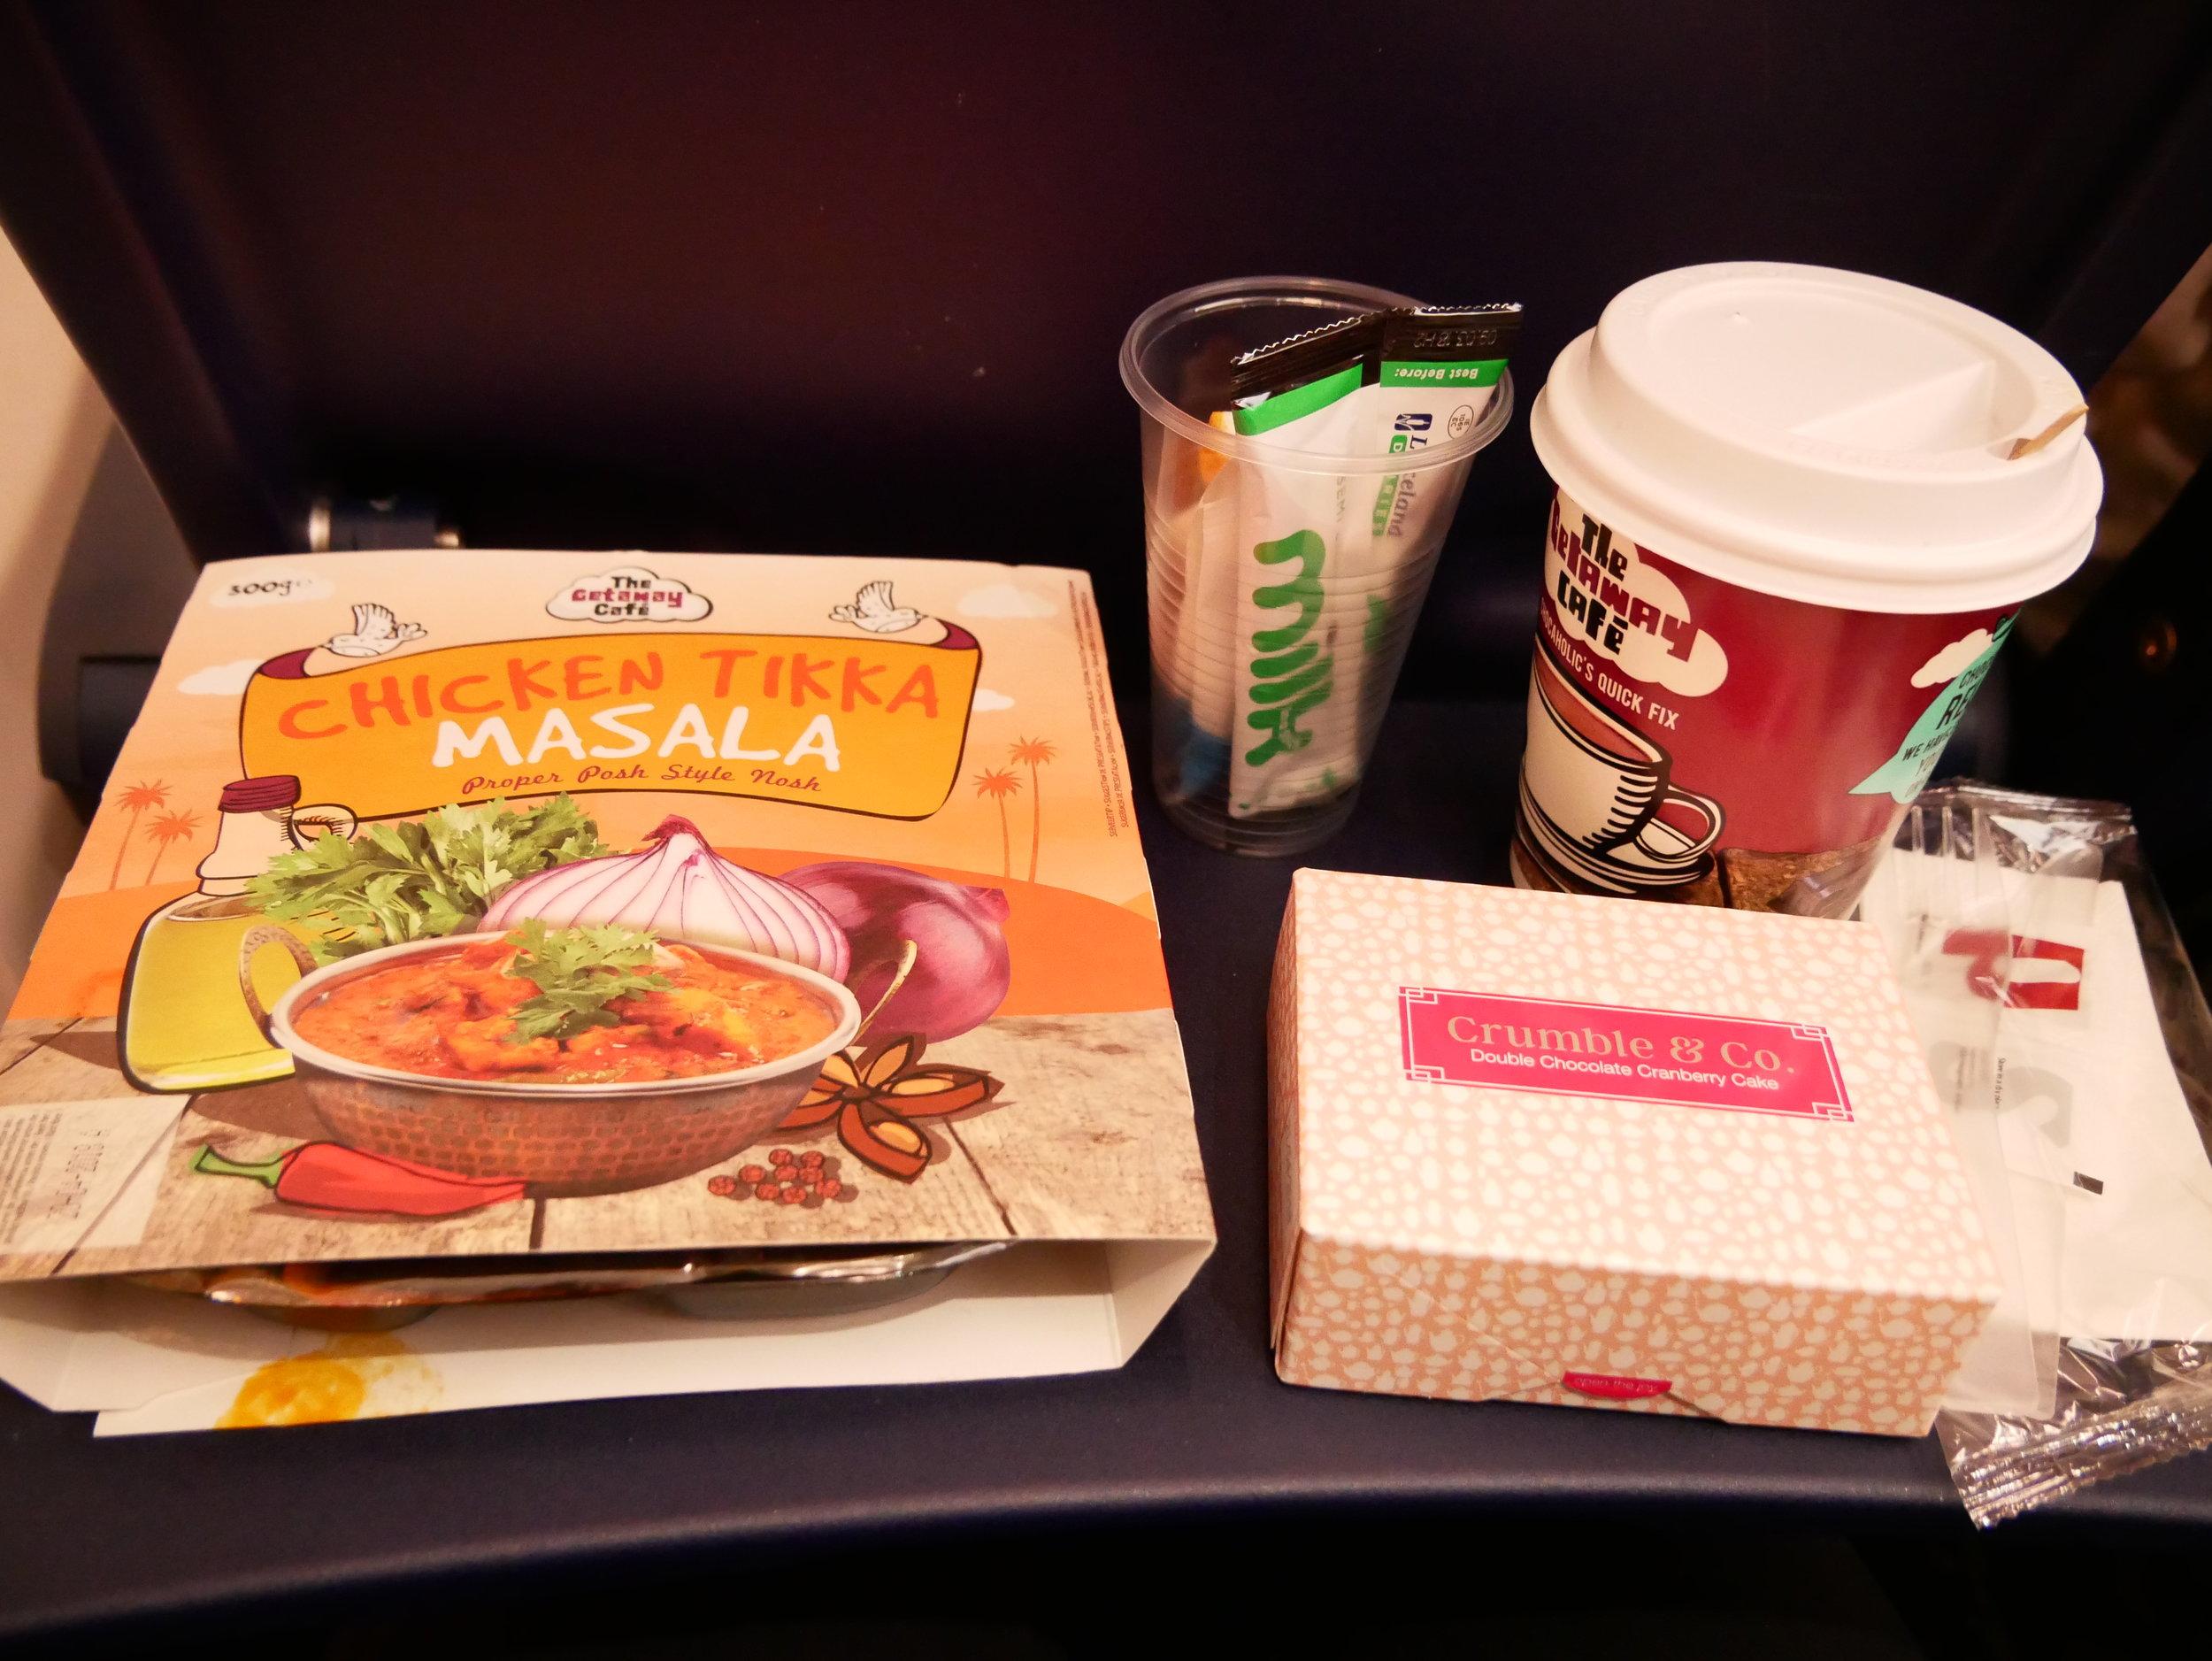 Ryanair Chicken Tikka Masala meal packaging.jpg